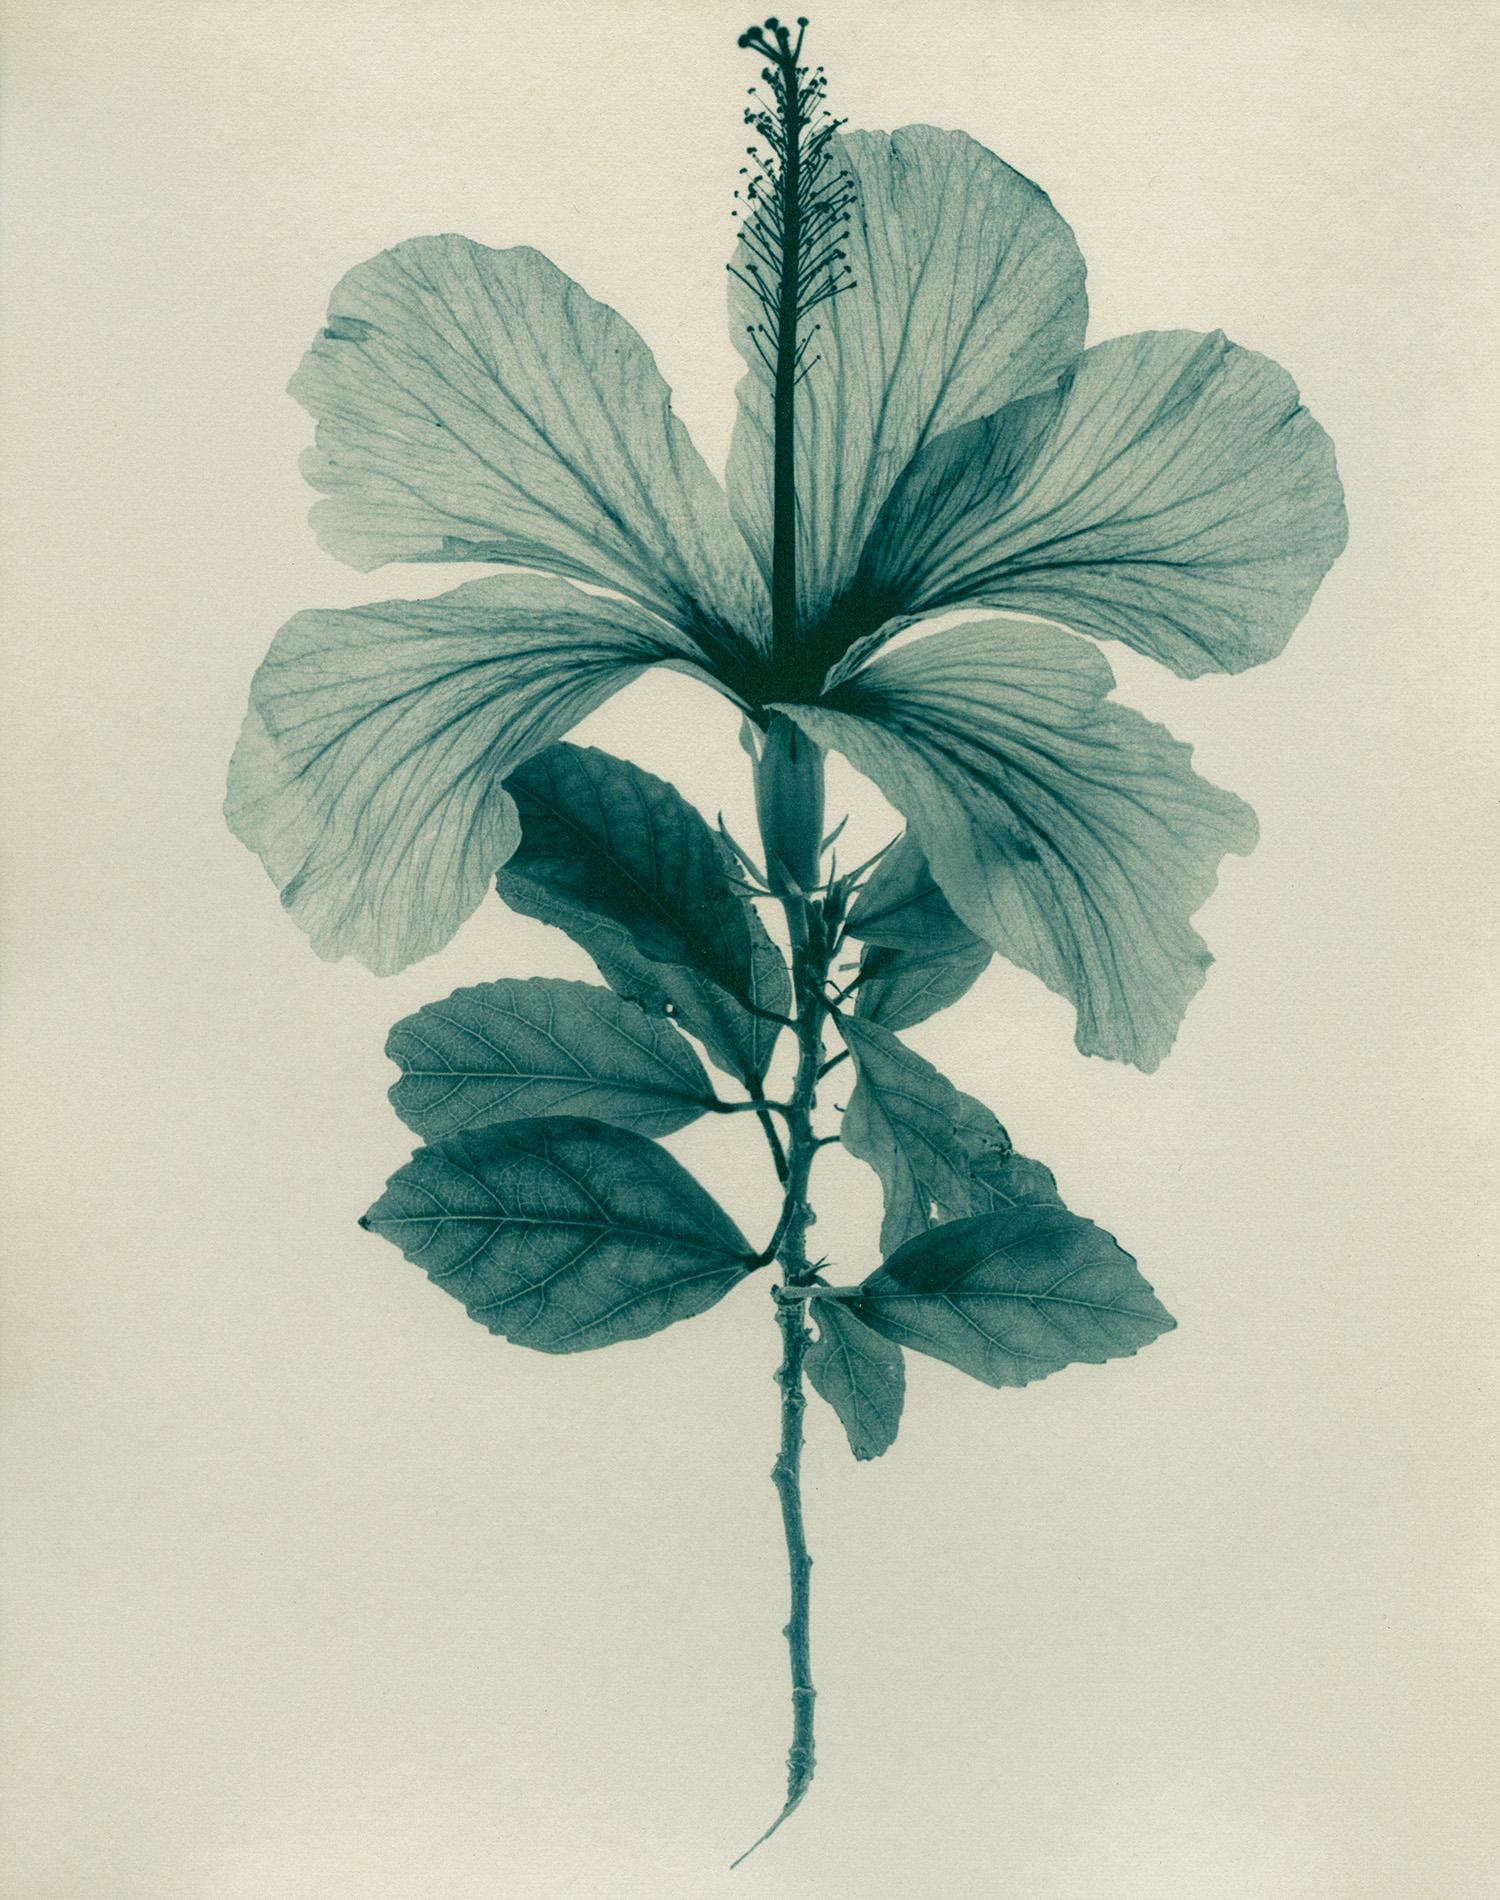 Cyan-Hibiscus1900x1500x72dpi-Sq.jpg